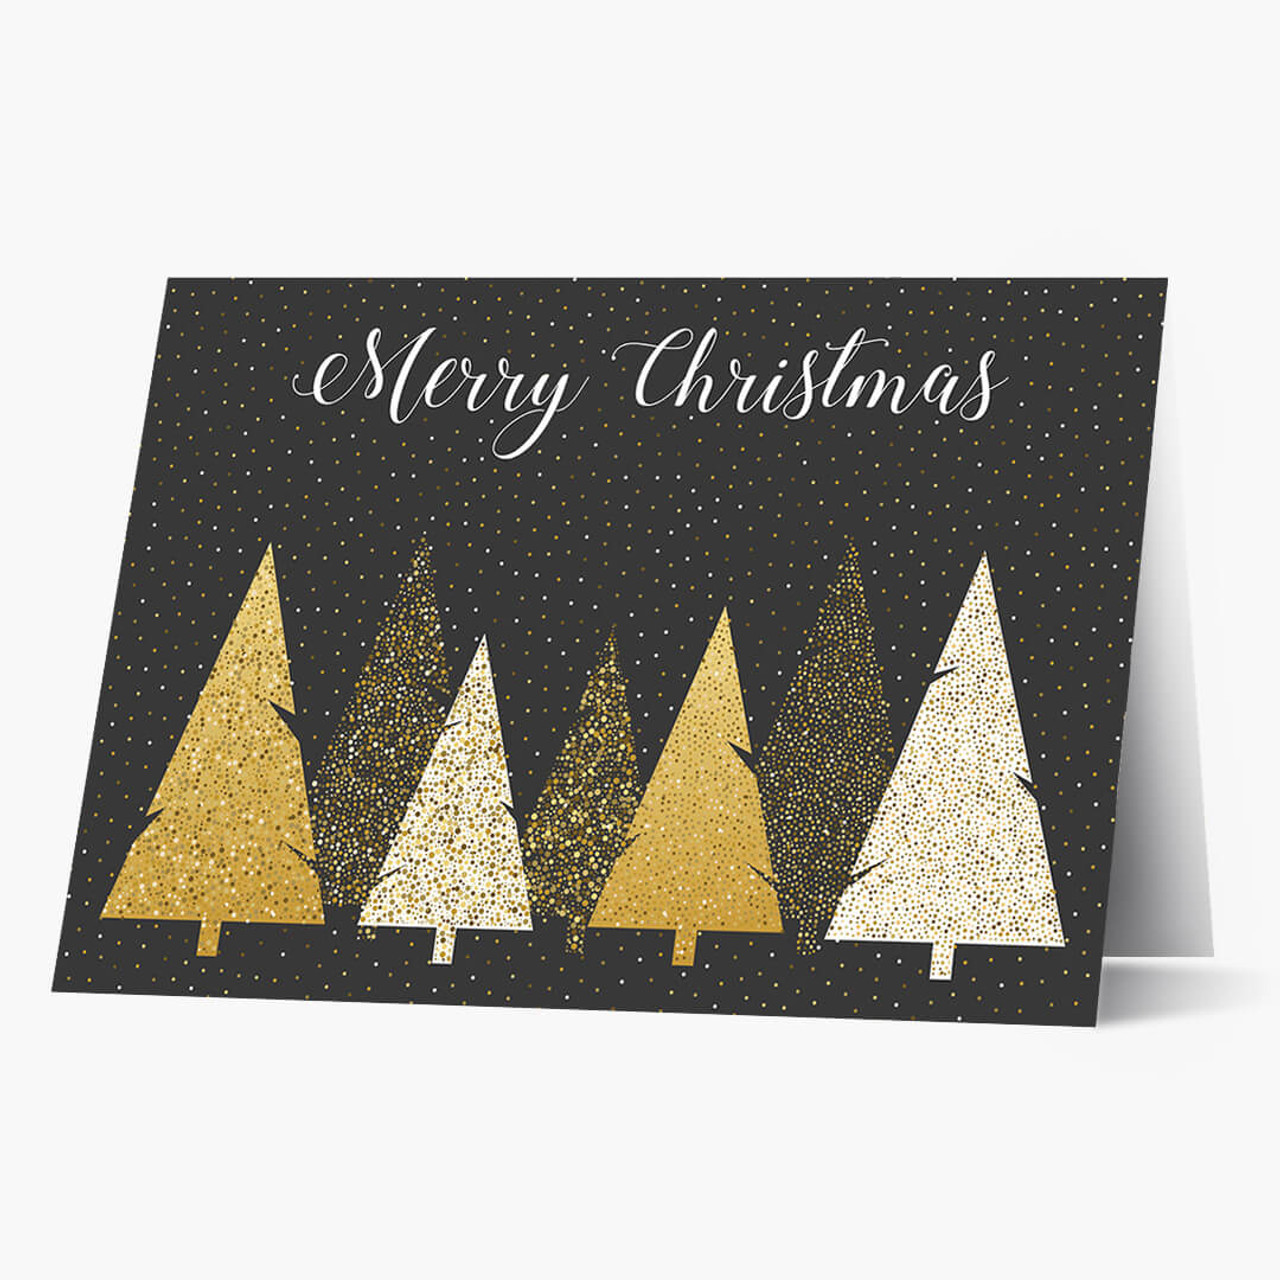 Merry Christmas Simplicity